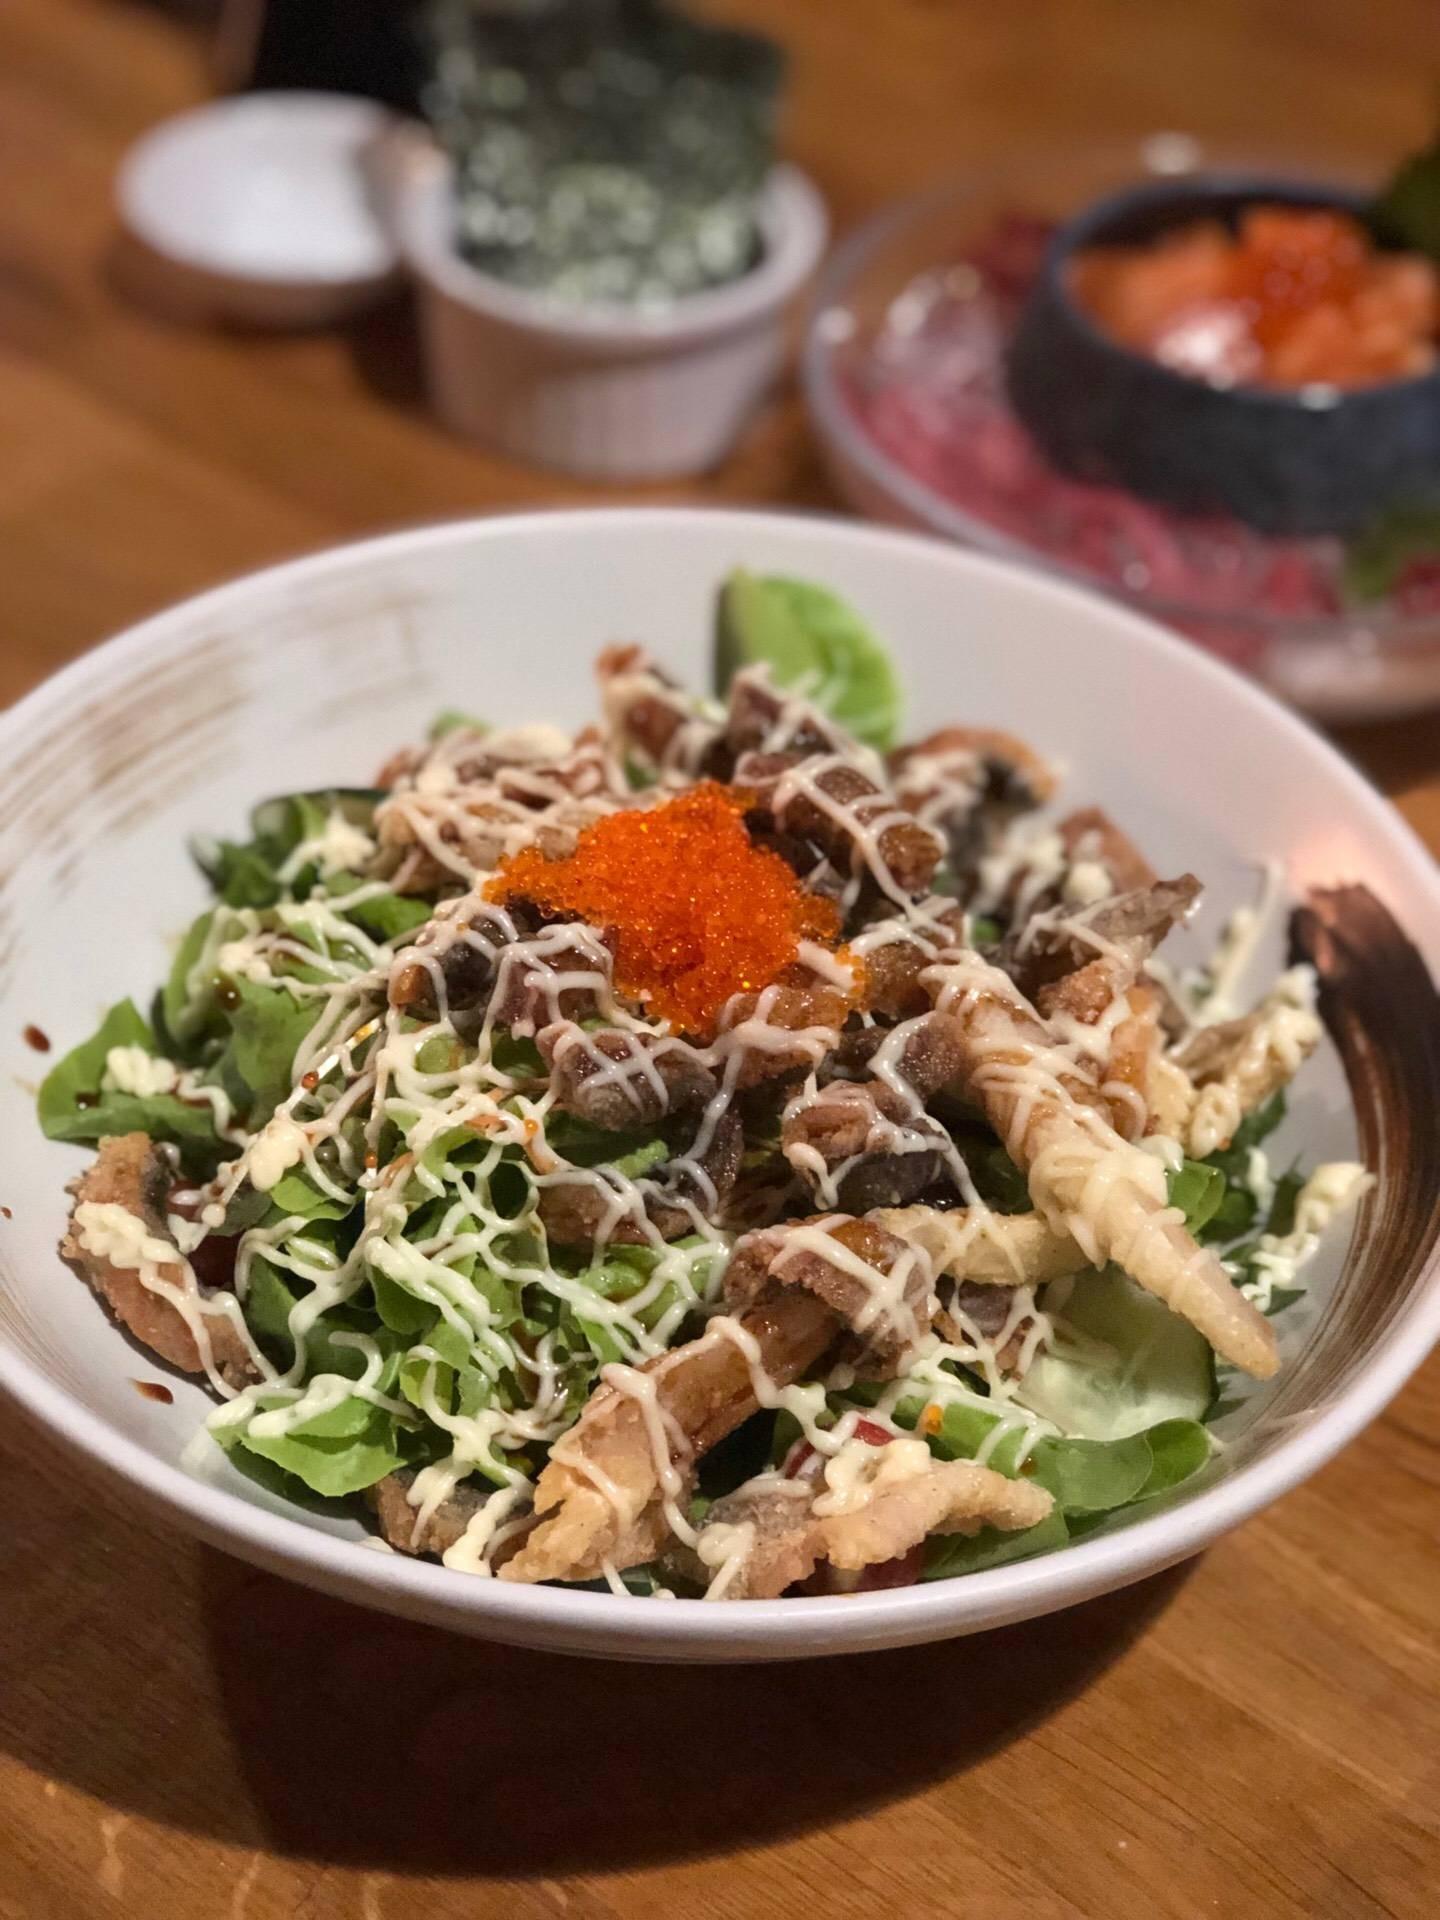 Jirafu Sushi & Beer Bar ลาดพร้าว ซอย 5